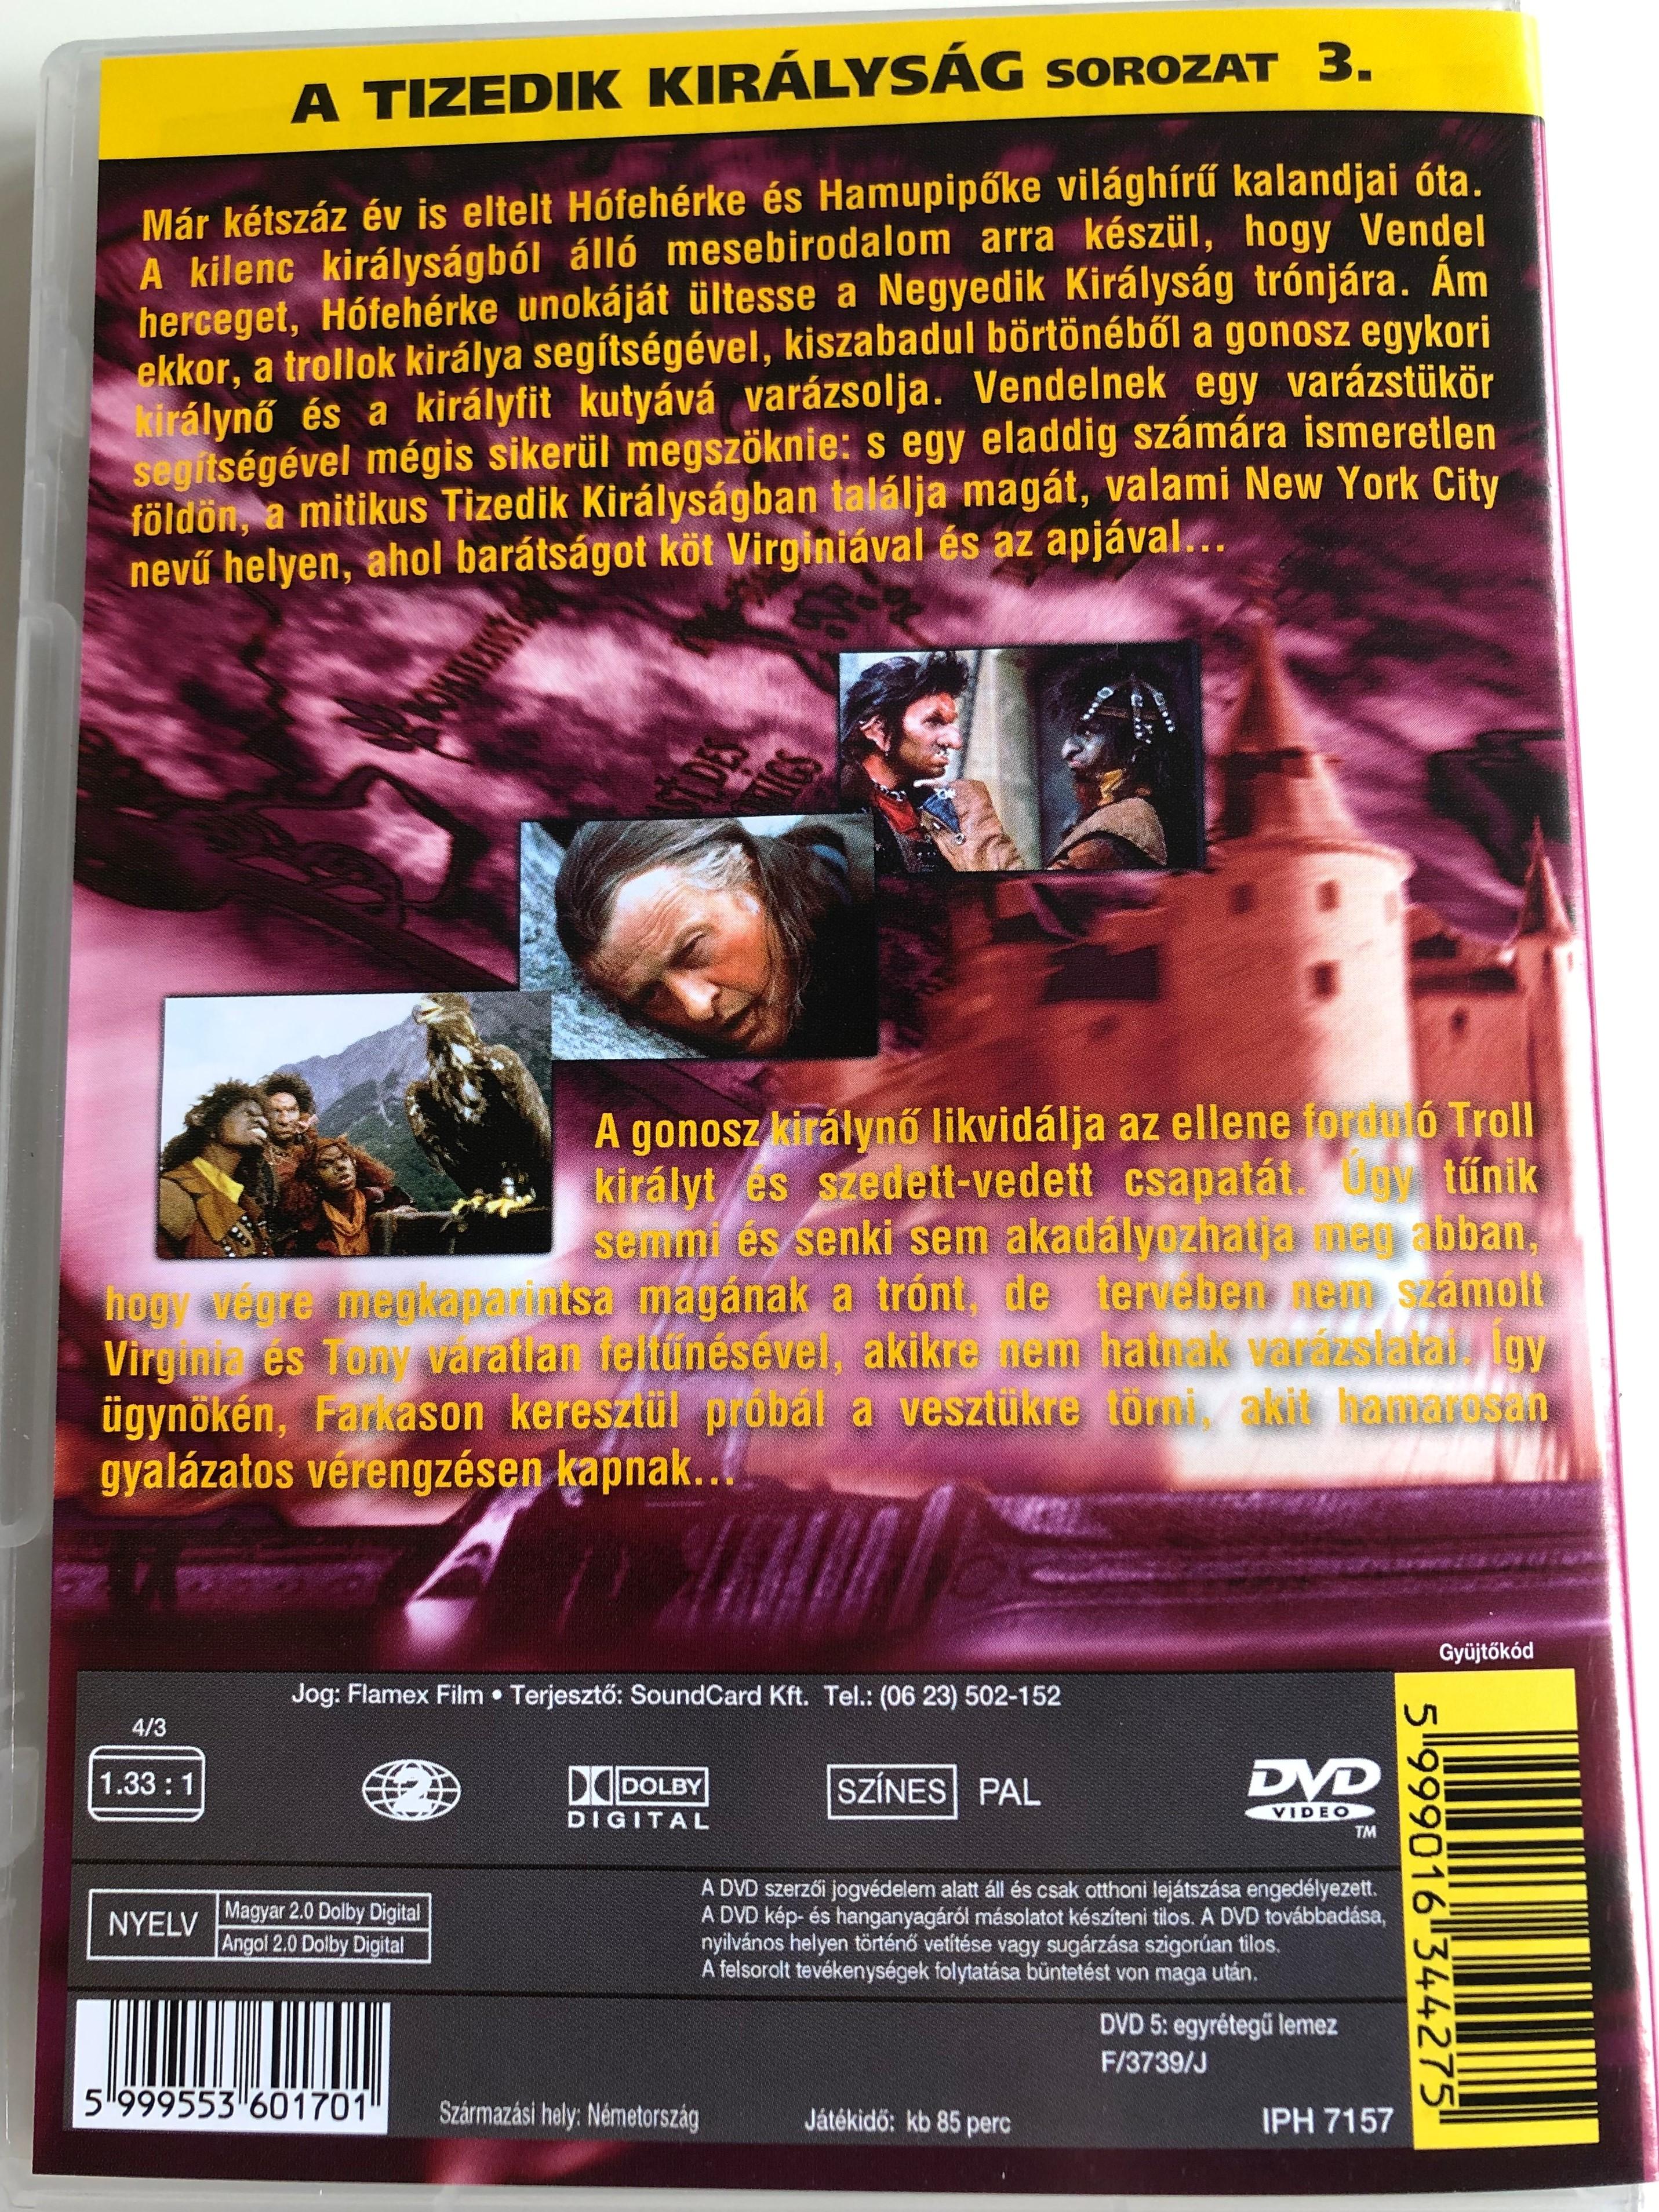 a-tizedik-kir-lys-g-4.-dvd-2000-the-10th-kingdom-part-4-directed-by-david-carson-herbert-wise-starring-ann-margret-ed-o-neill-scott-cohen-dianne-wiest-rutger-hauer-2-.jpg